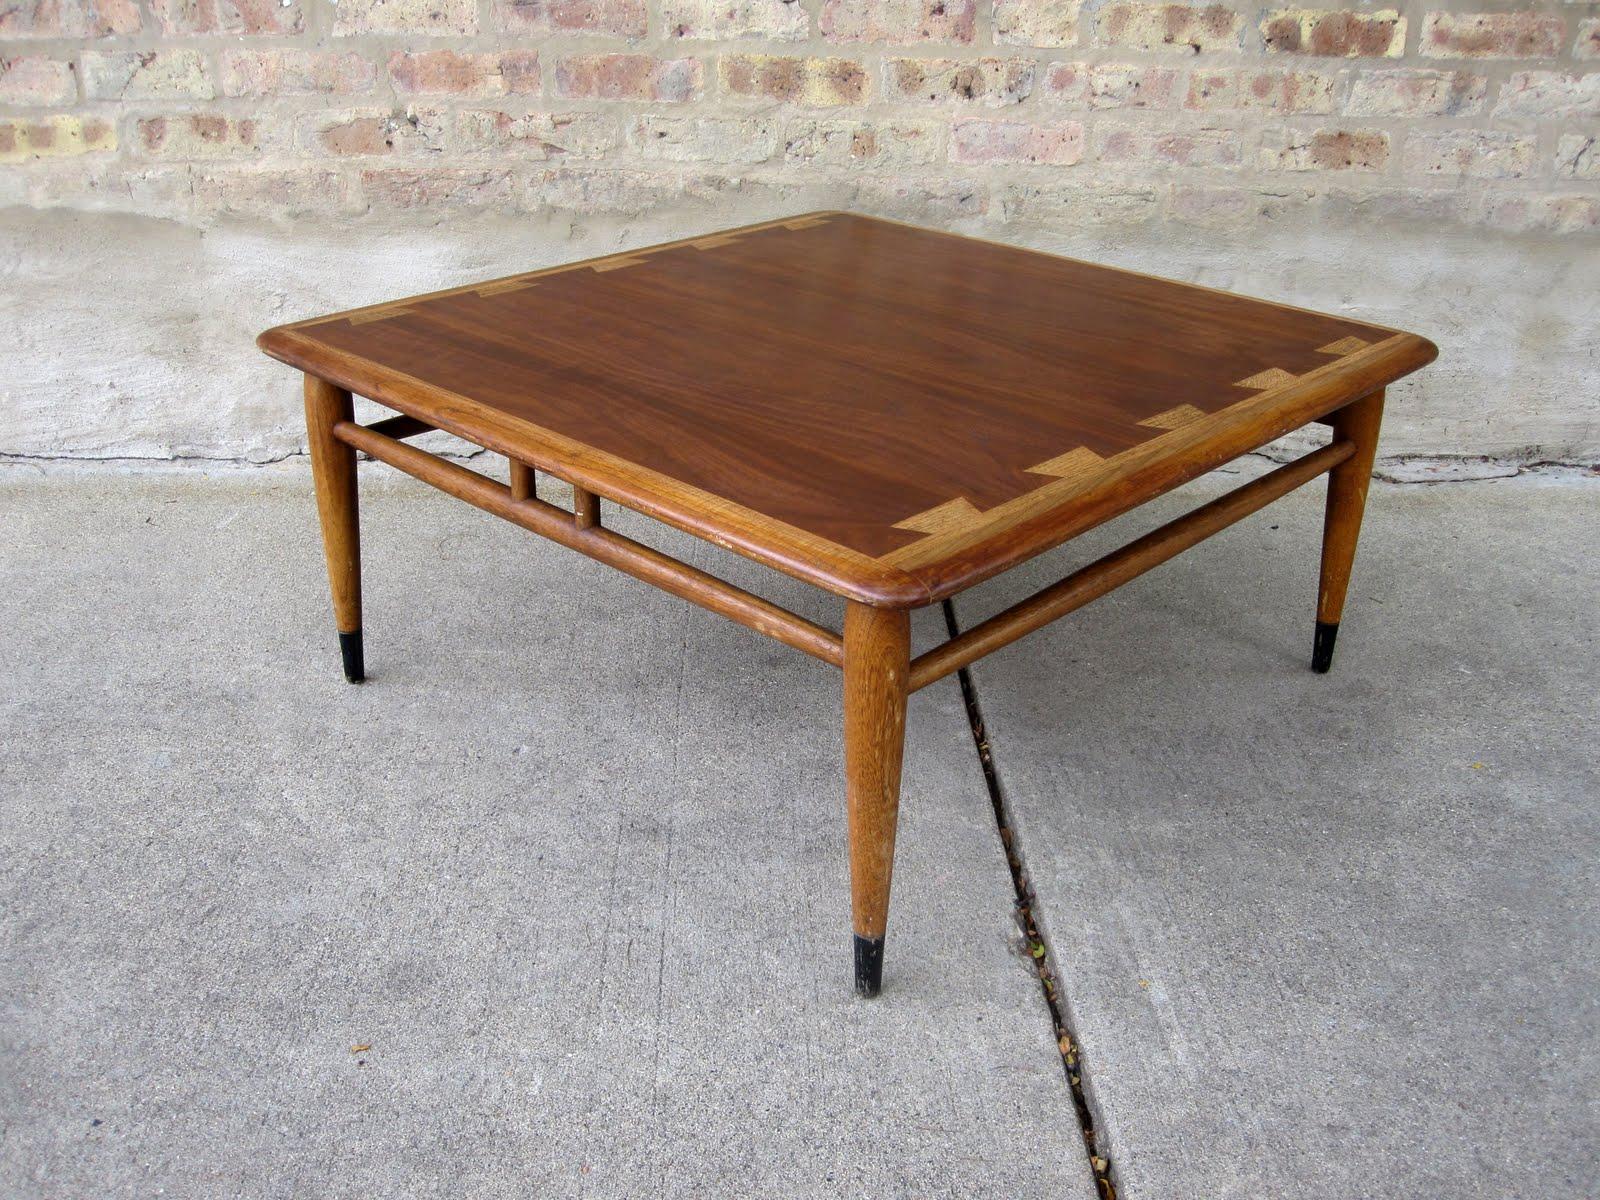 circa midcentury: 'lane' acclaim square coffee table